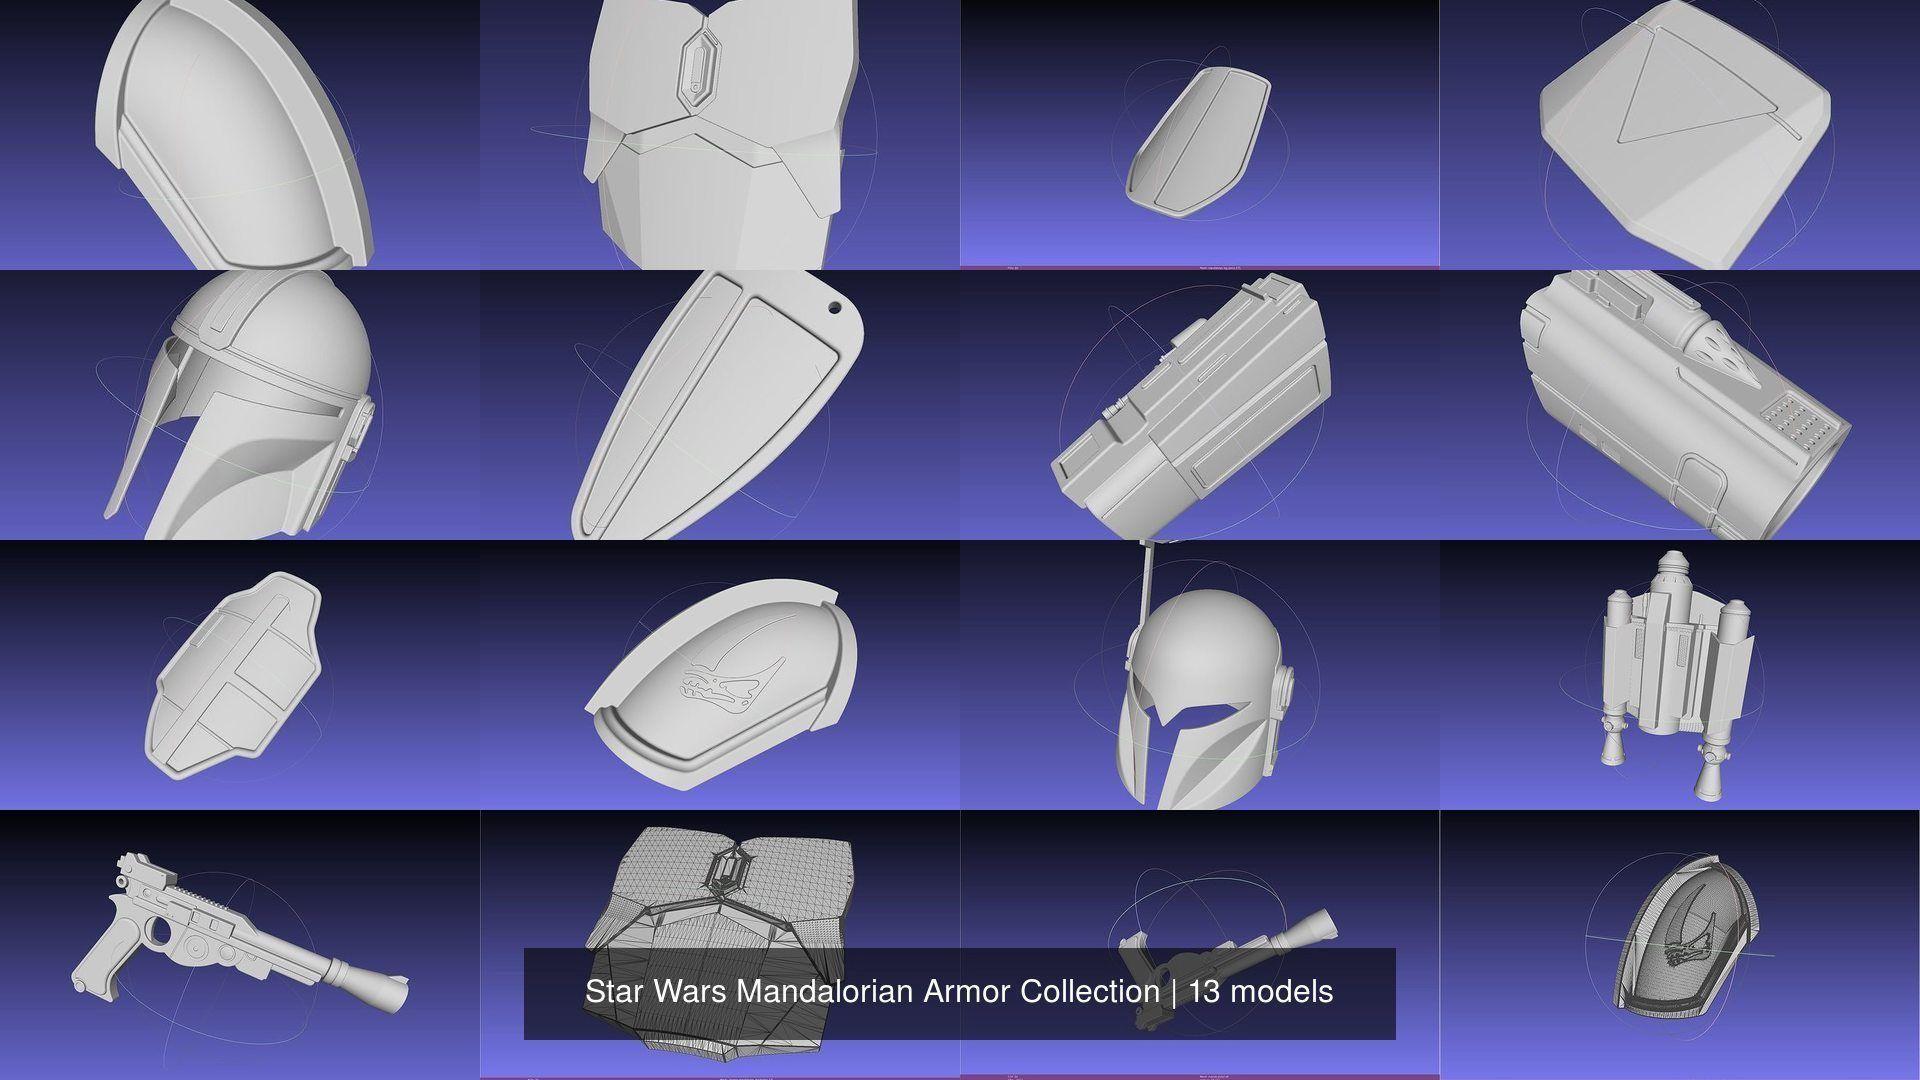 Star Wars Mandalorian Armor Collection